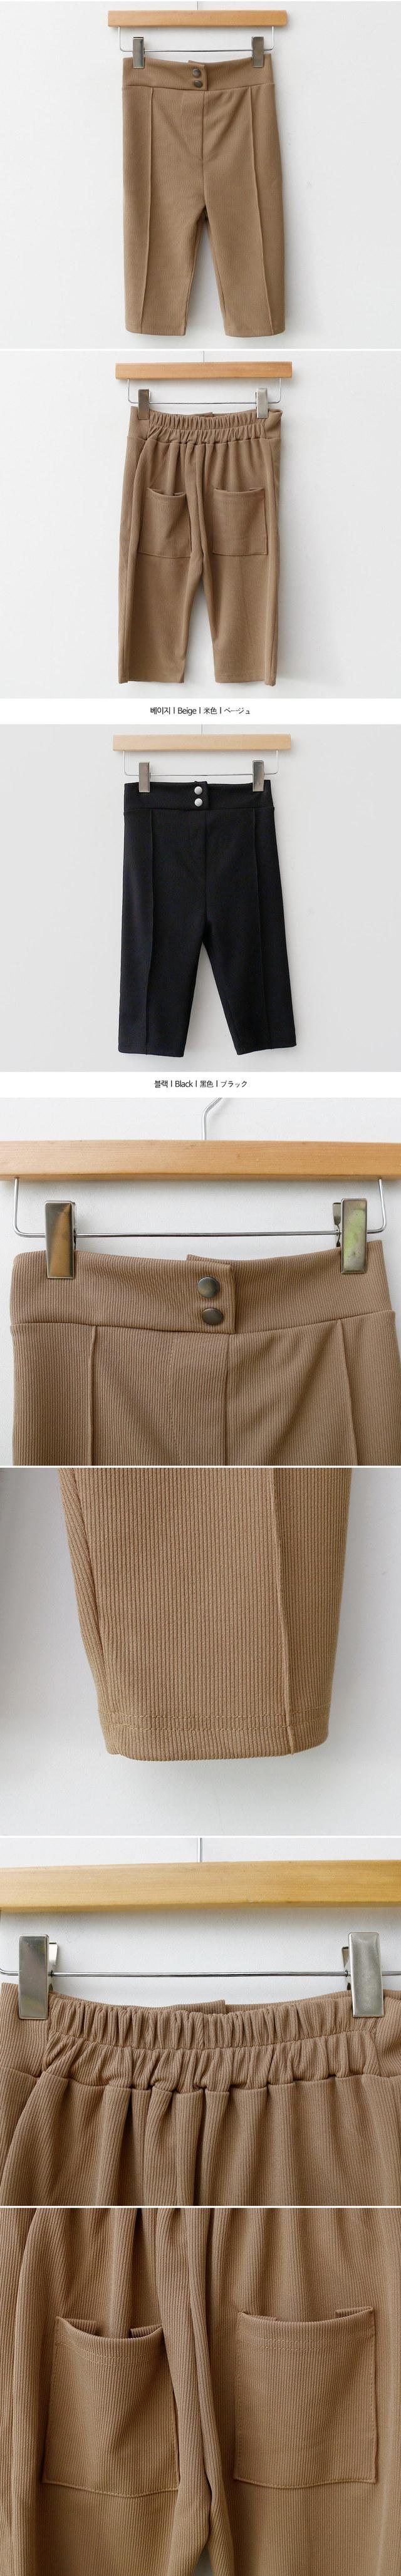 Tension 5 pants